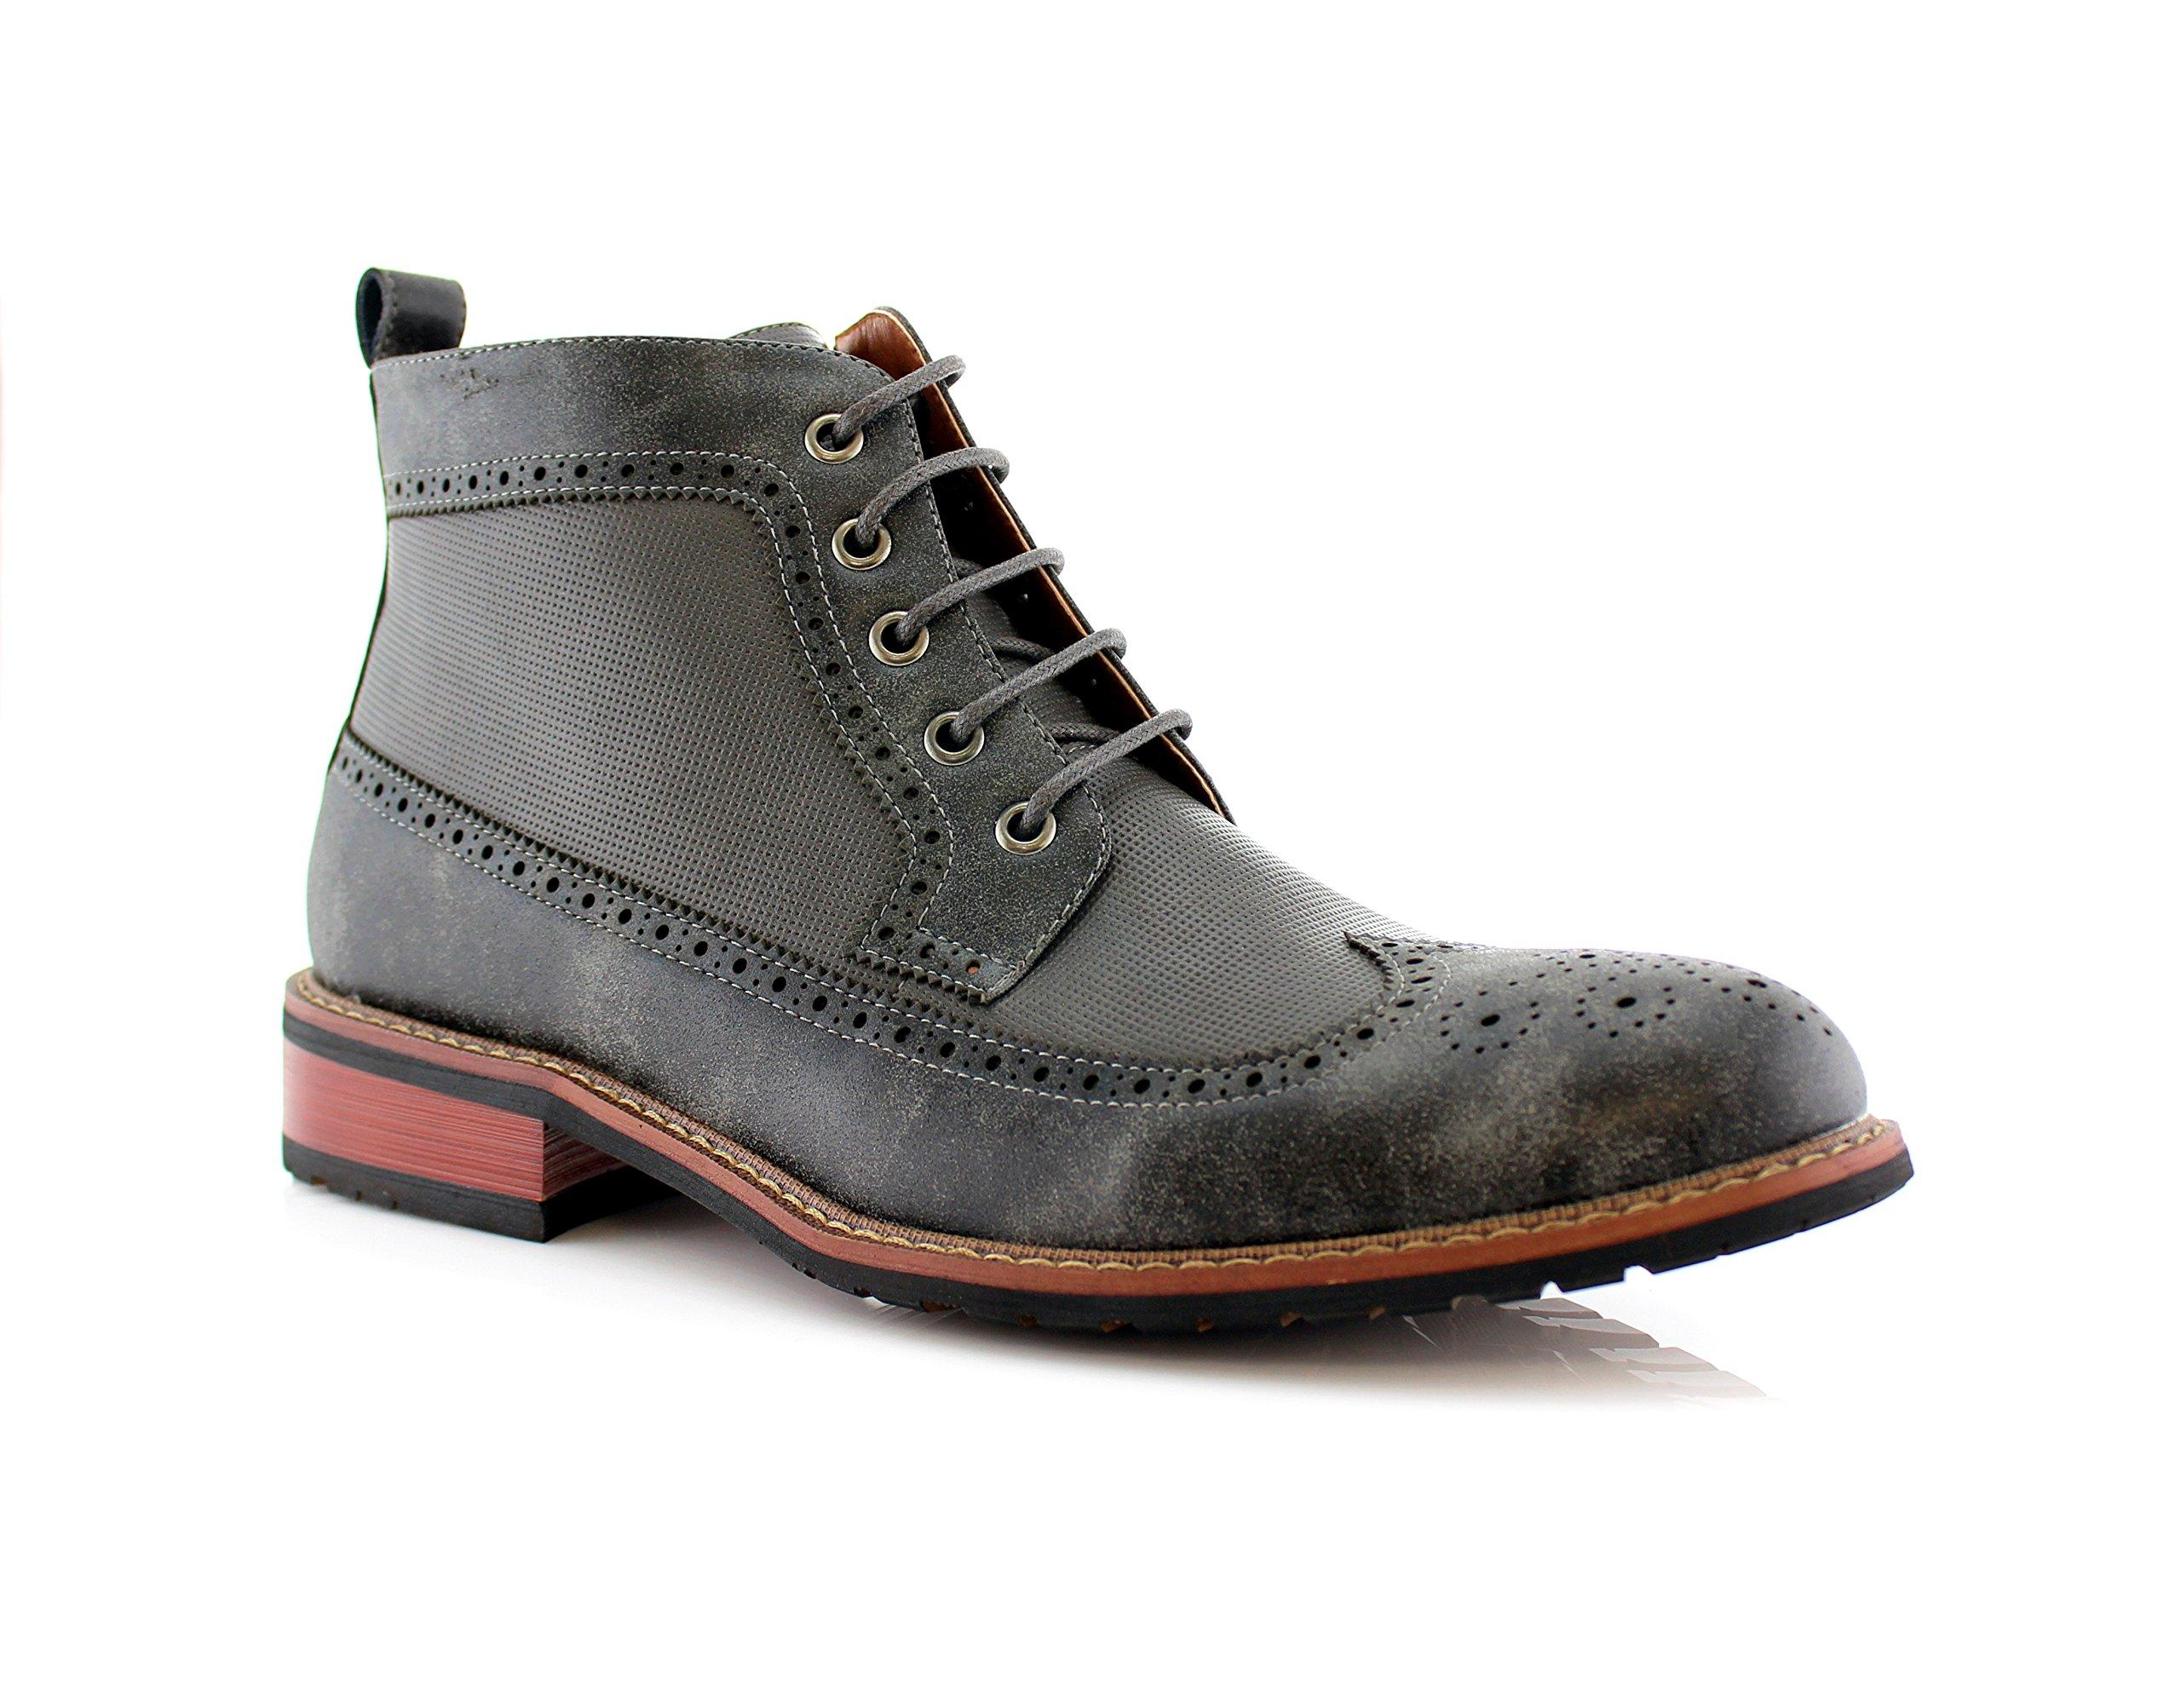 Ferro Aldo Michael MFA806278 Mens Casual Wing Tip Perforated Mid -Top Brogue Boots - Grey, Size 10 by Ferro Aldo